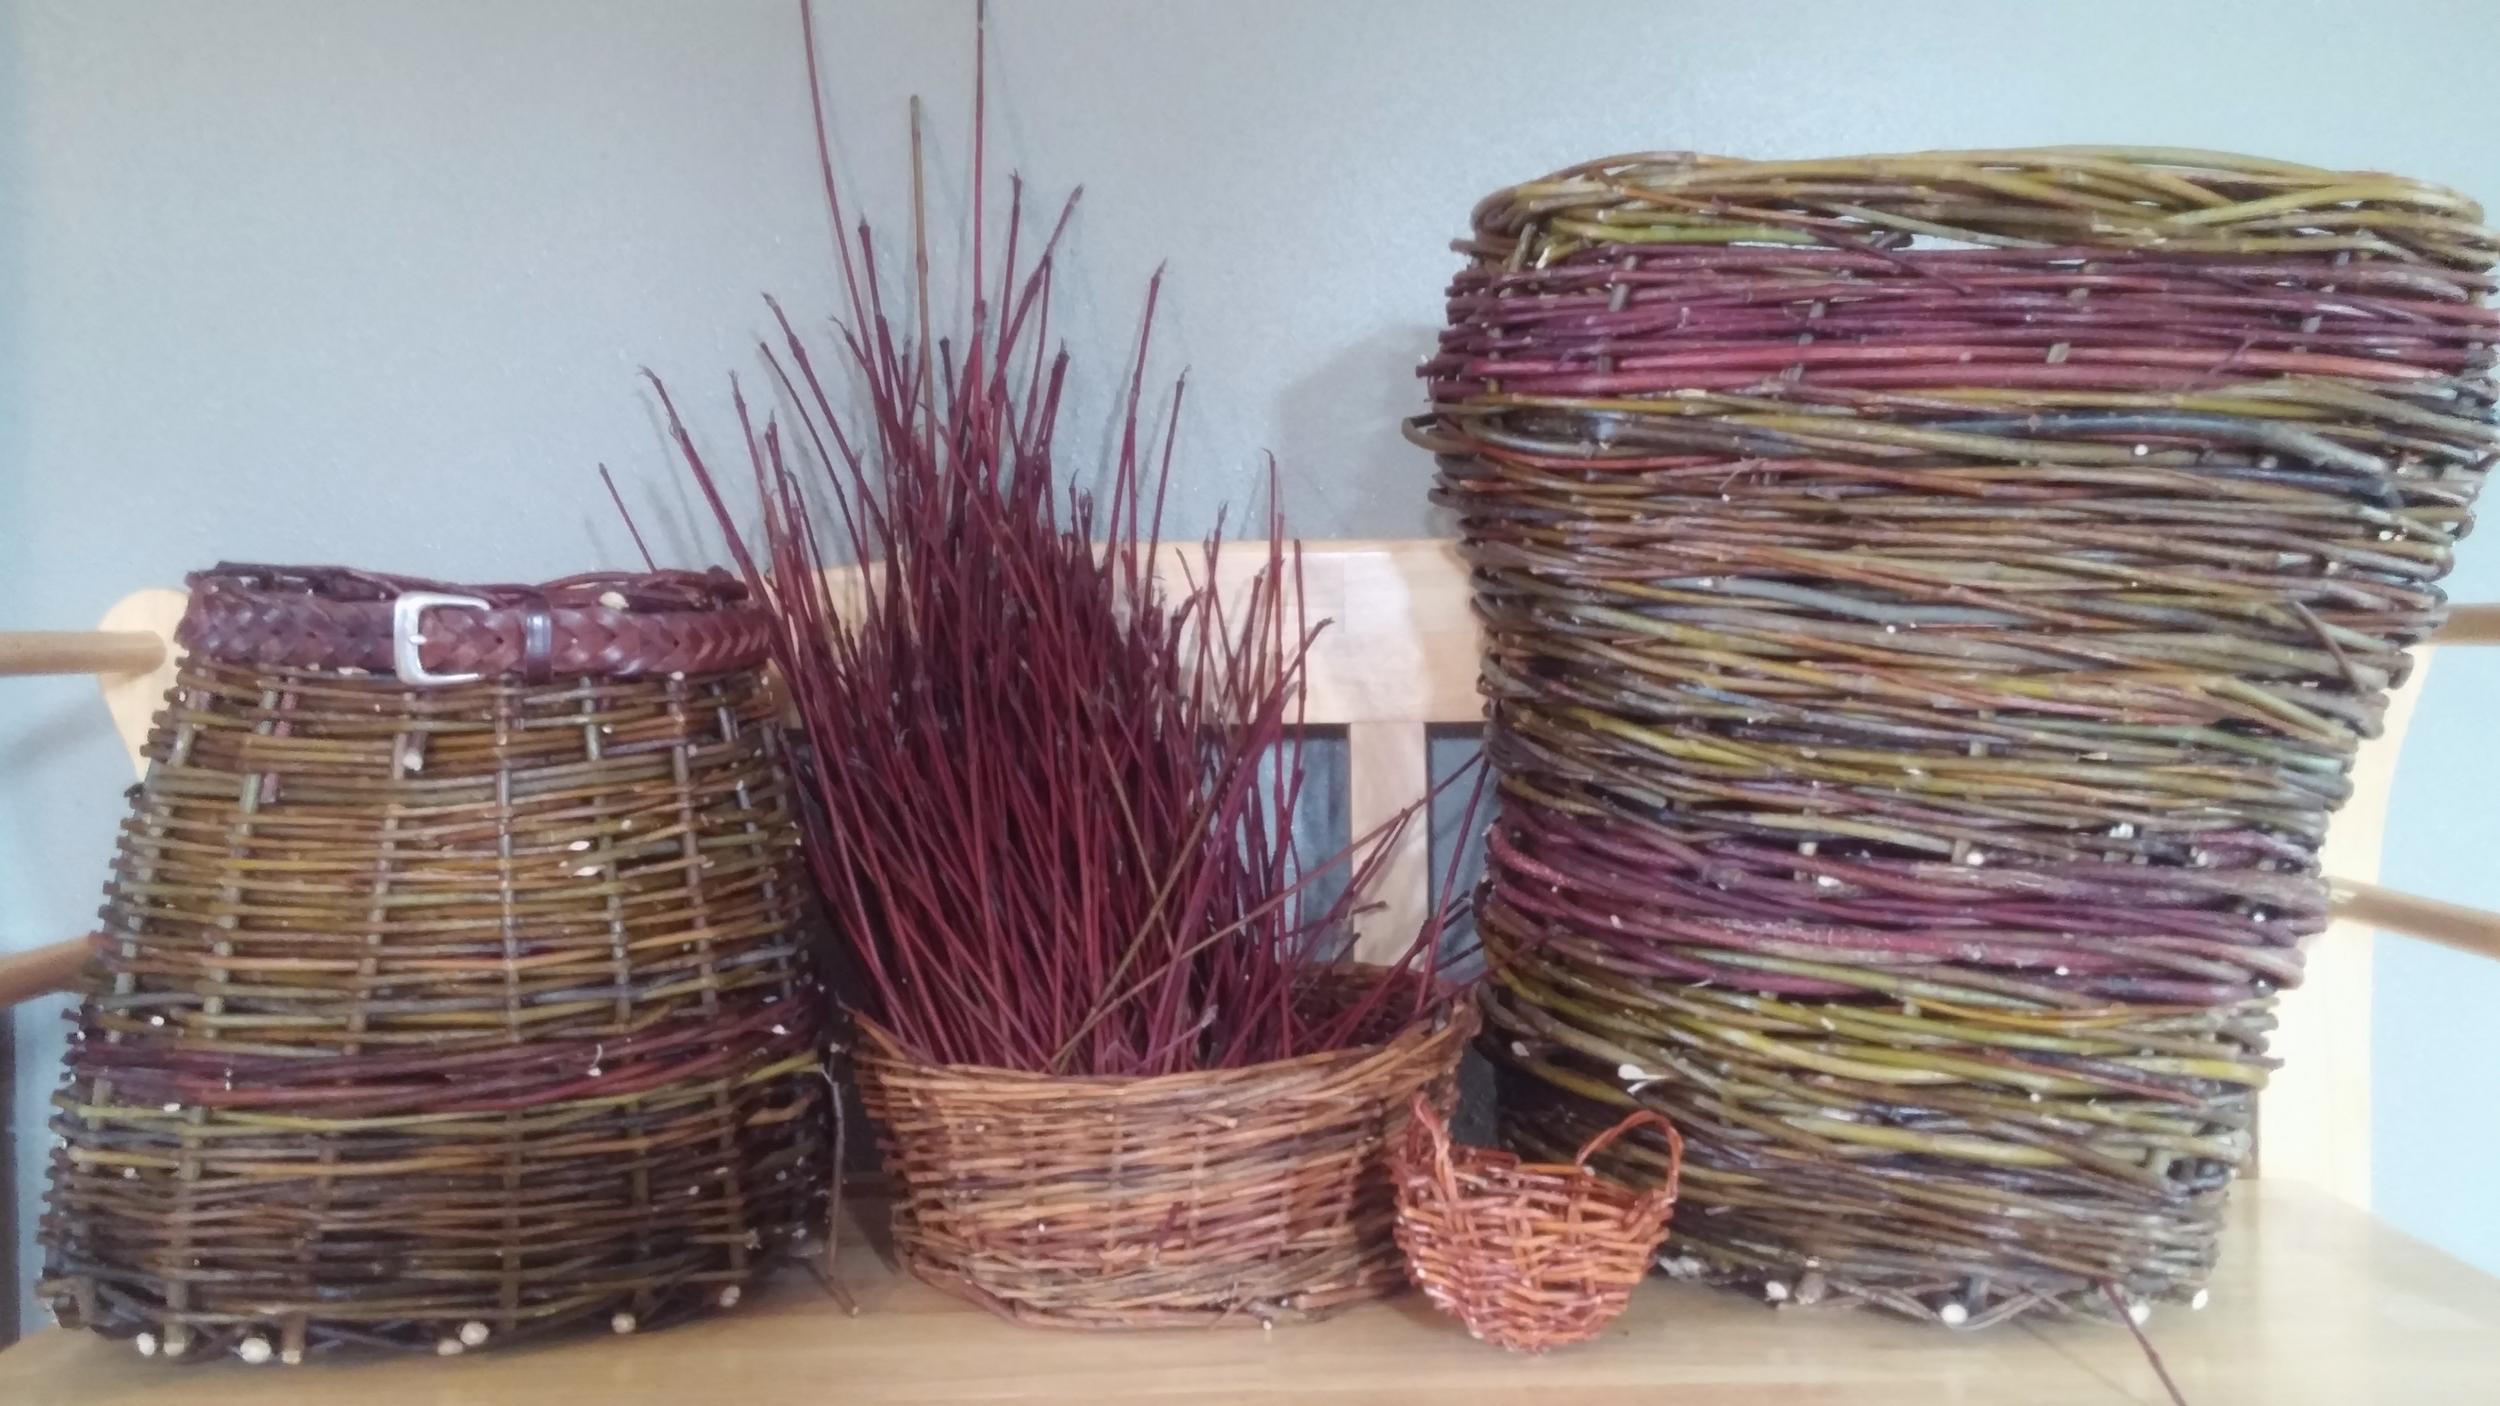 willow baskets.jpg